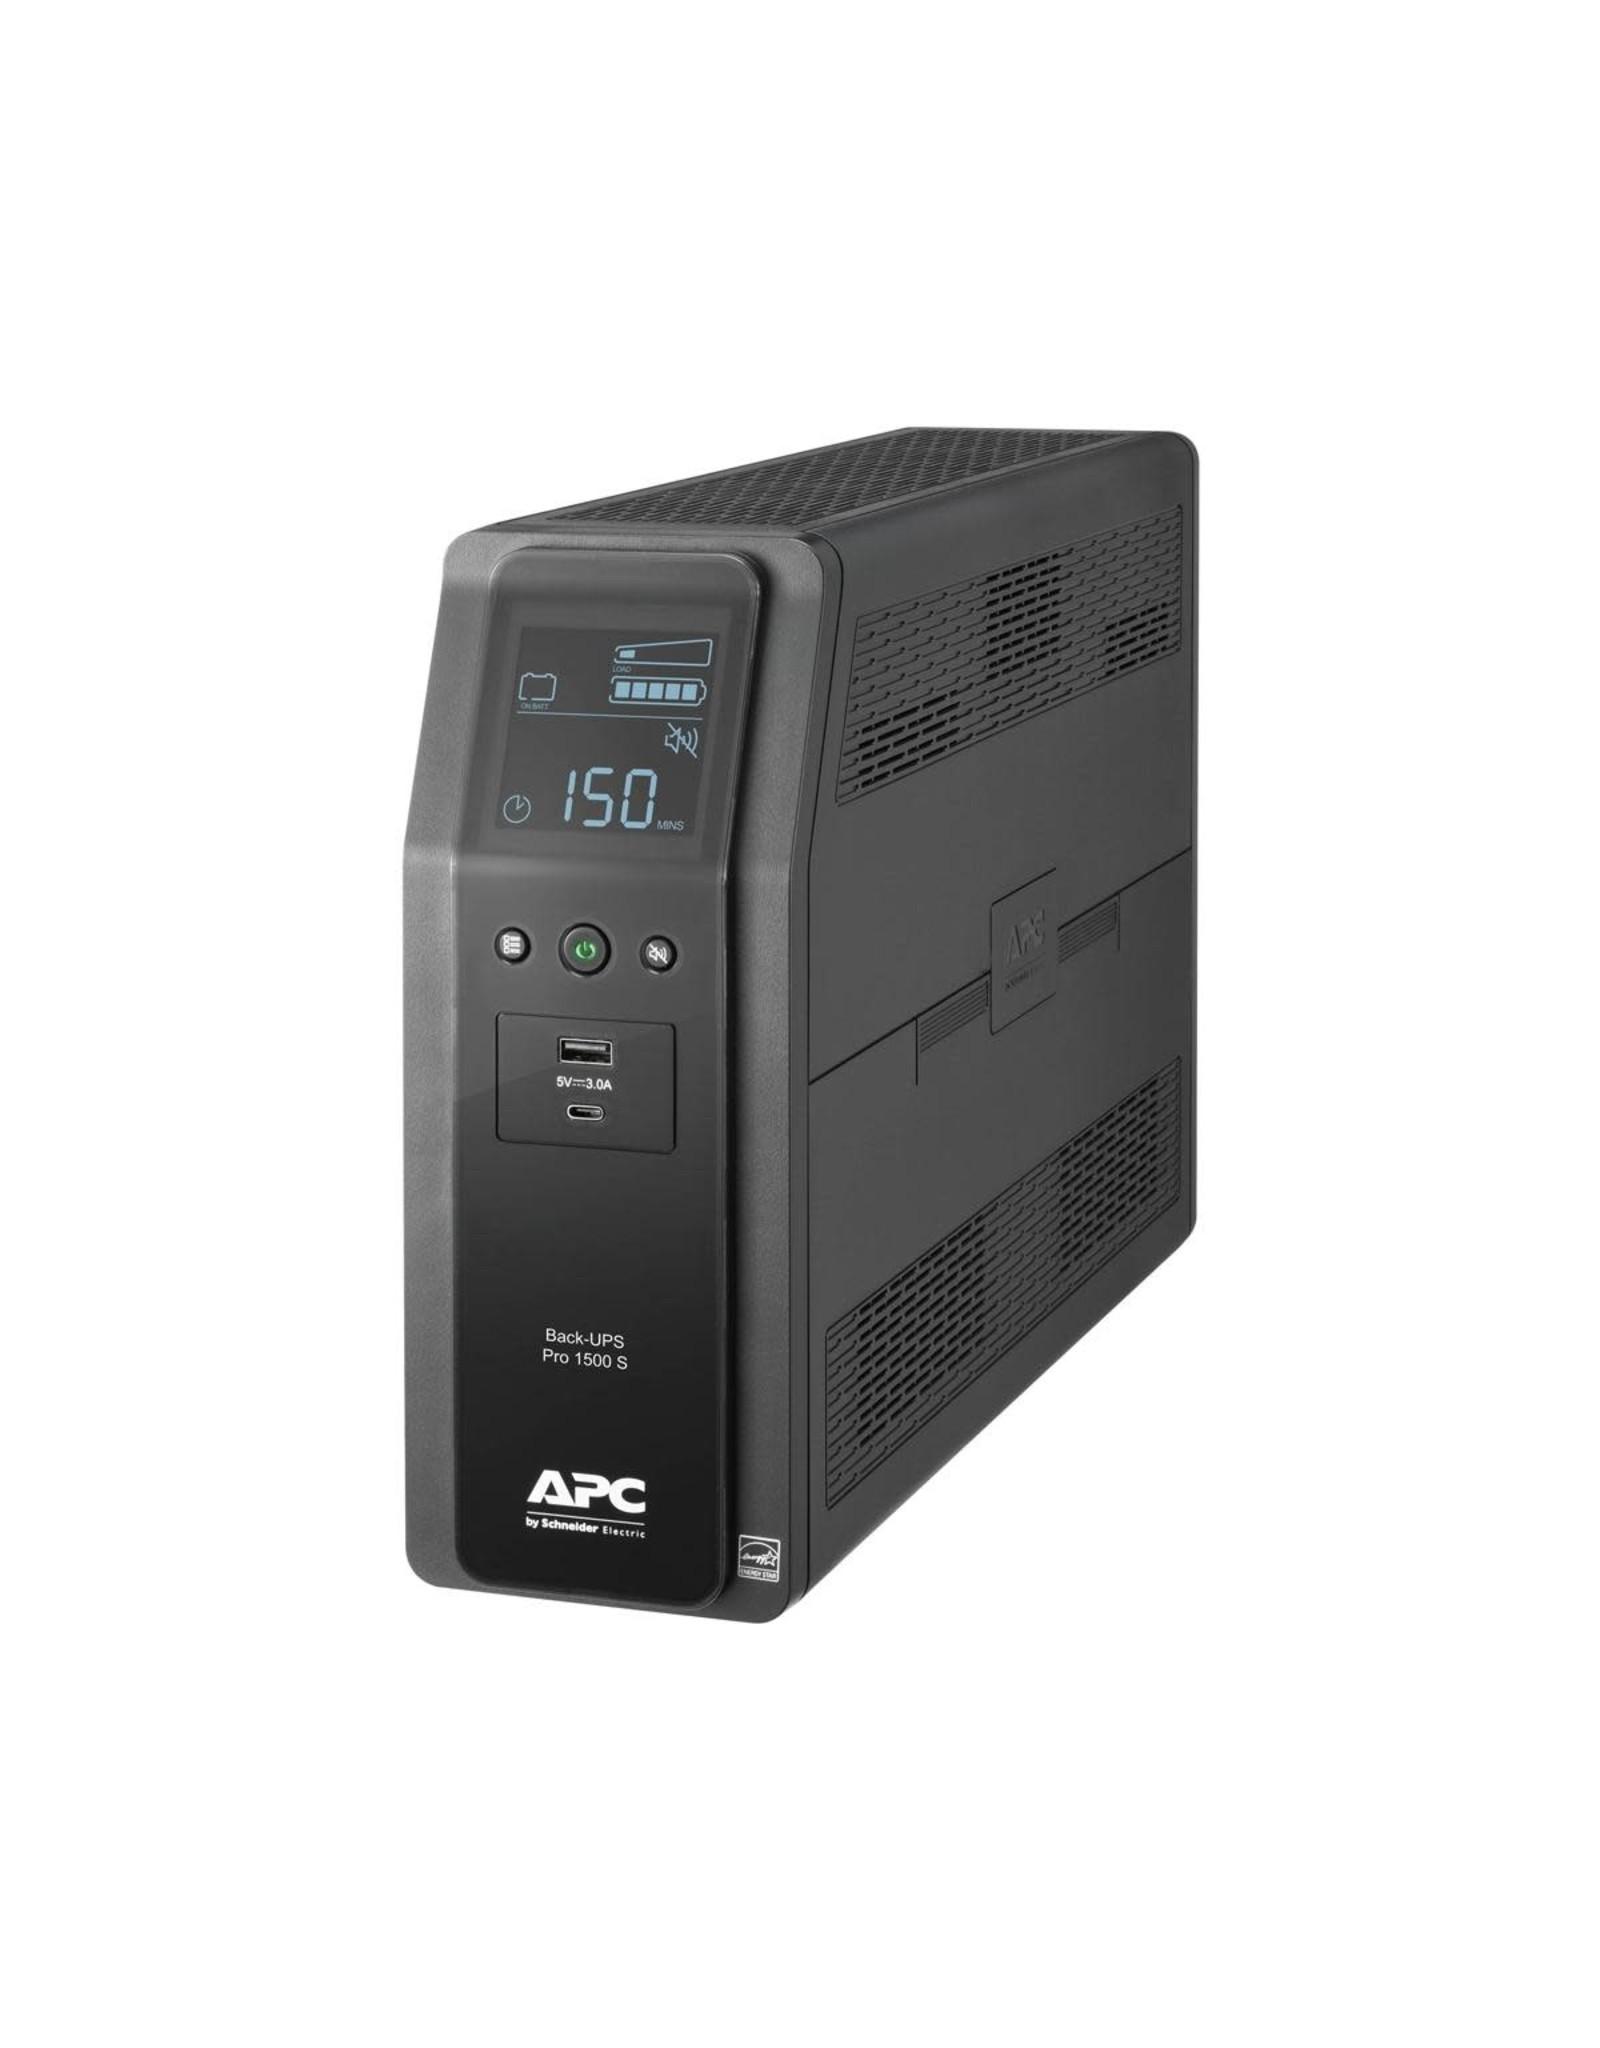 APC APC Back-UPS PRO BR 1500VA, SineWave, 10 Outlets, 2 USB Charging Ports, AVR, LCD interface